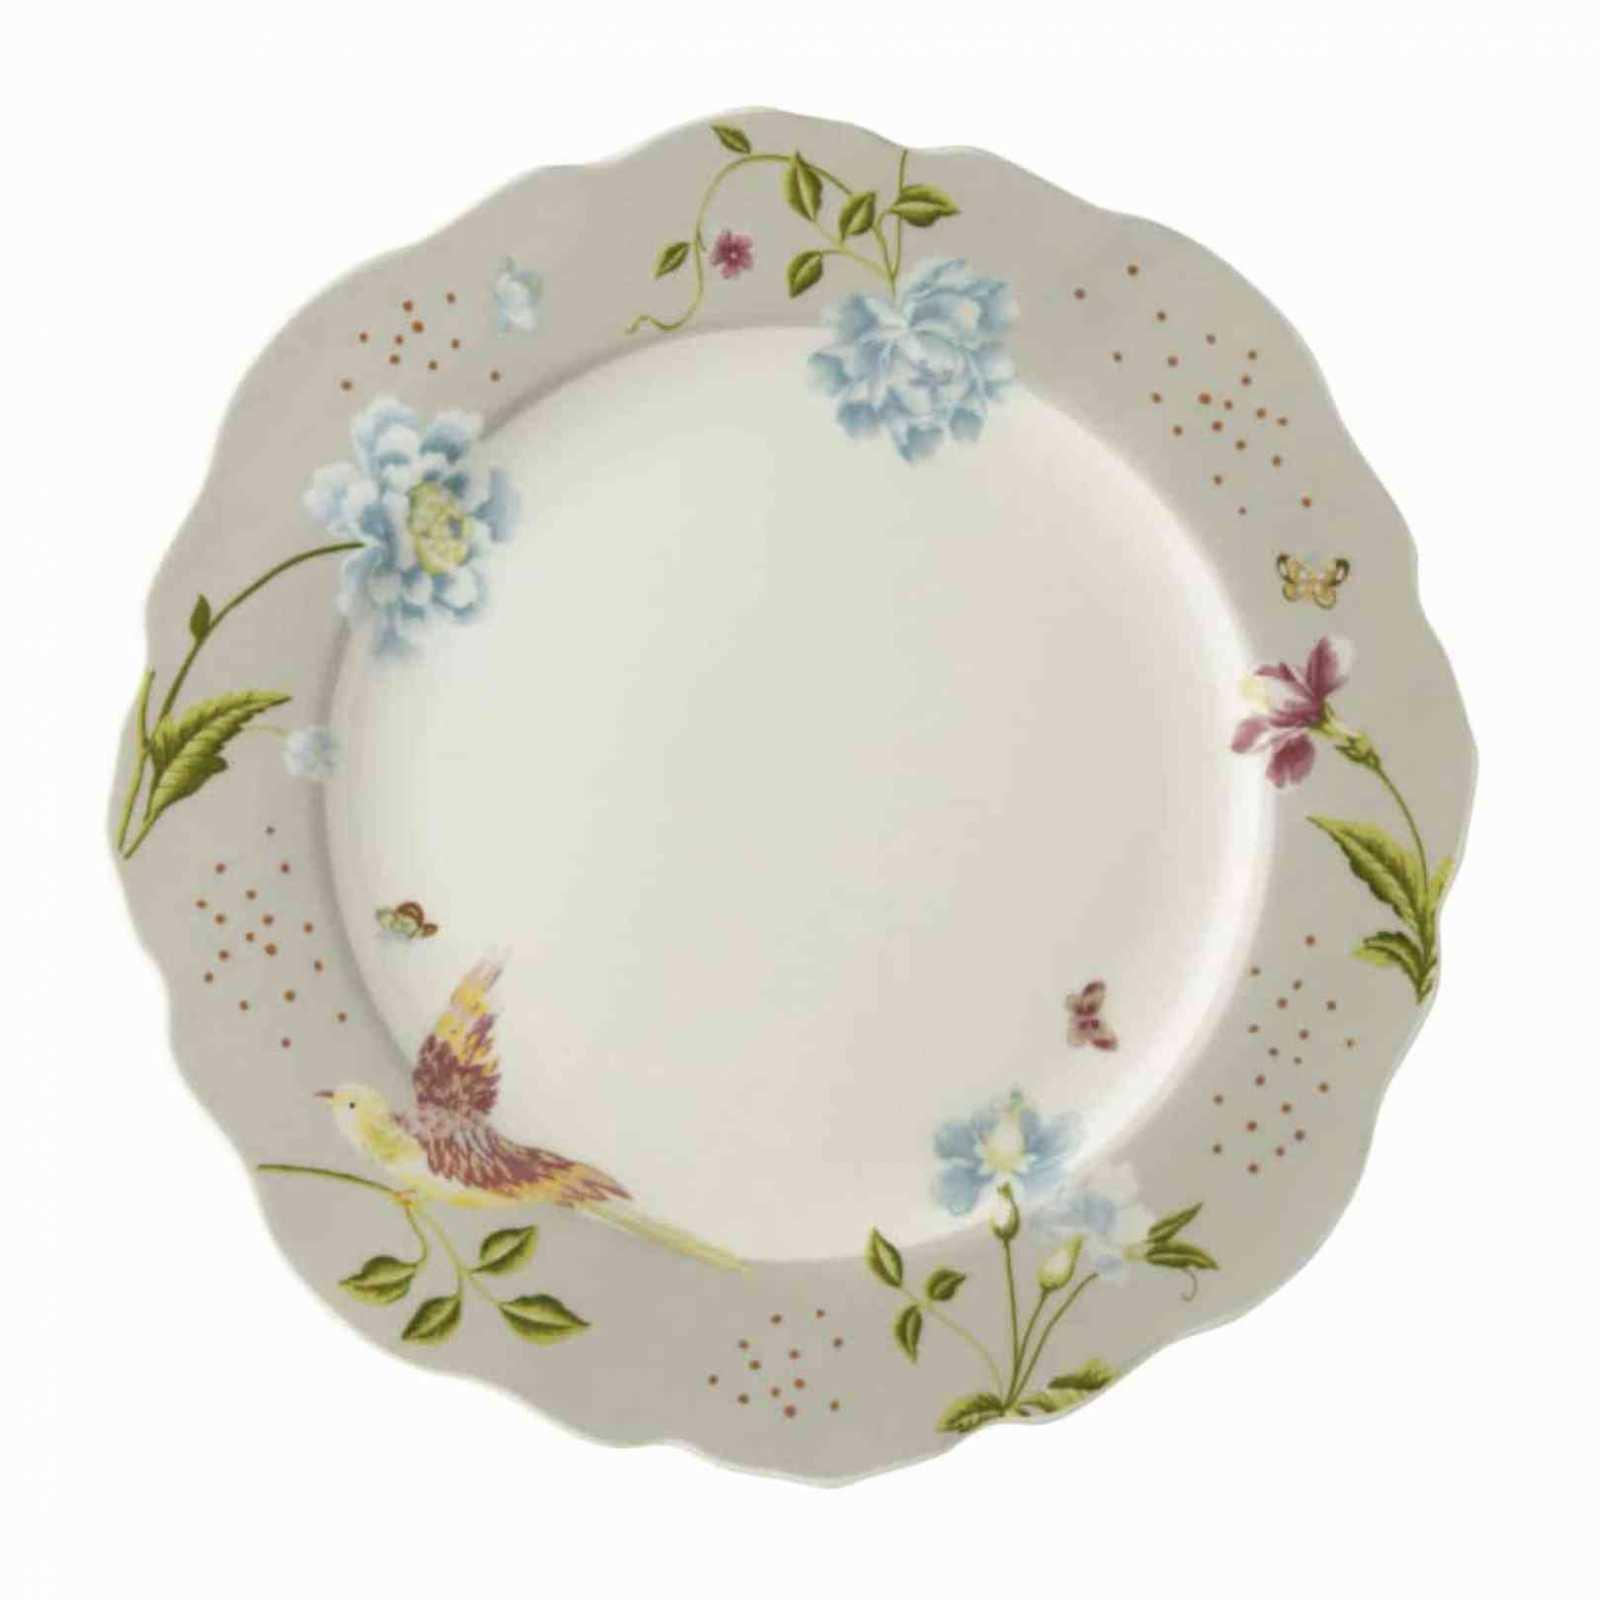 Онлайн каталог PROMENU: Тарелка Laura Ashley HERITAGE, диаметр 24,5 см, серый с цветами и птицей                               180450